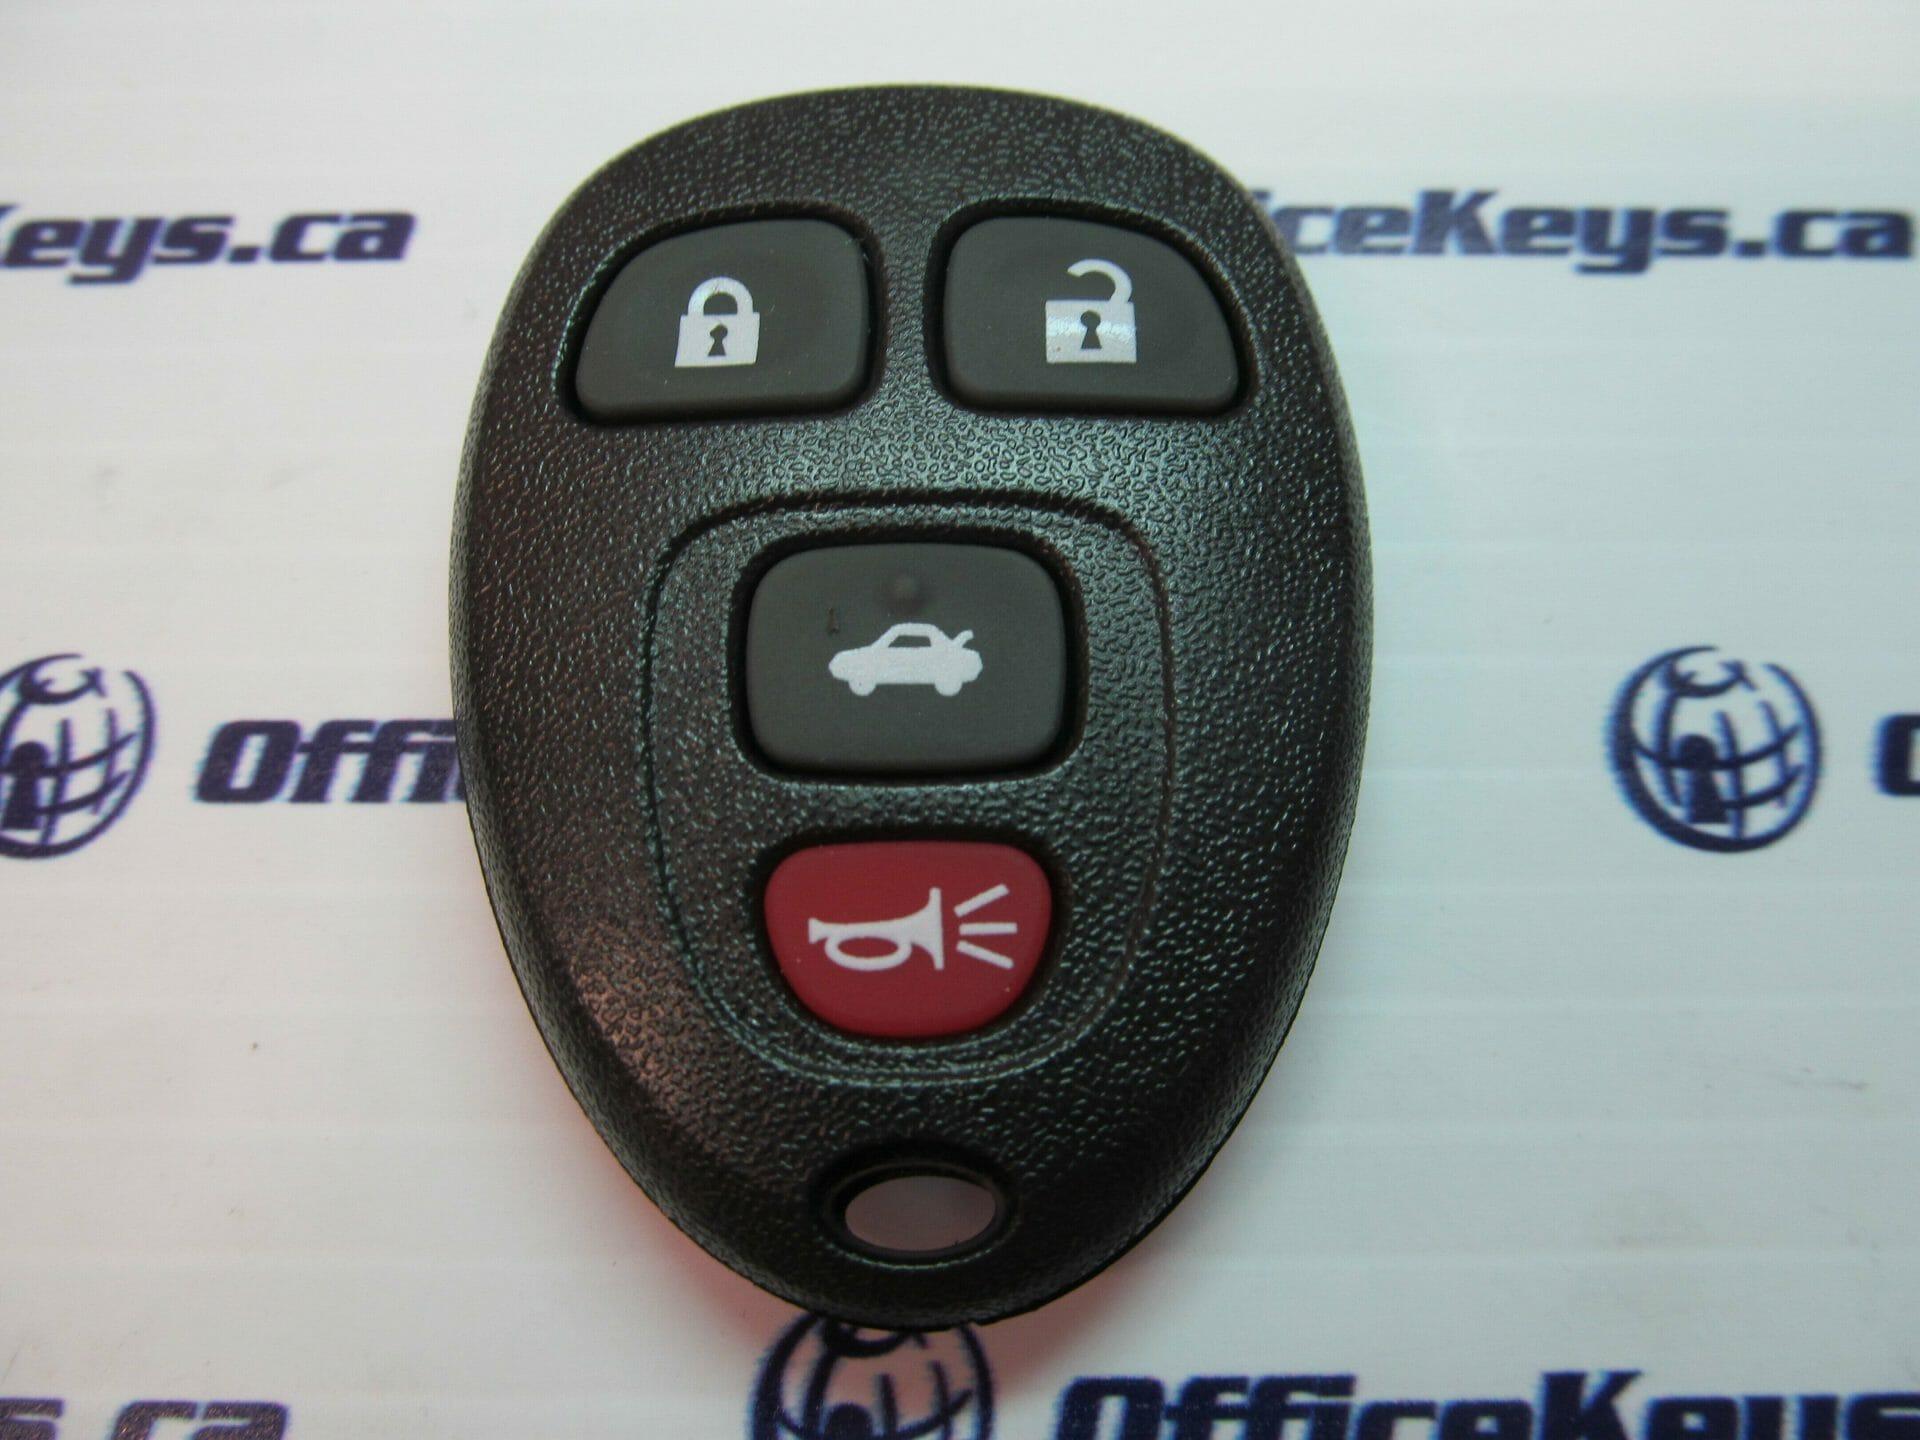 2006-2013 GM Chevy Cadillac Buick Key Fob OEM Keyless Entry Remote 10337866